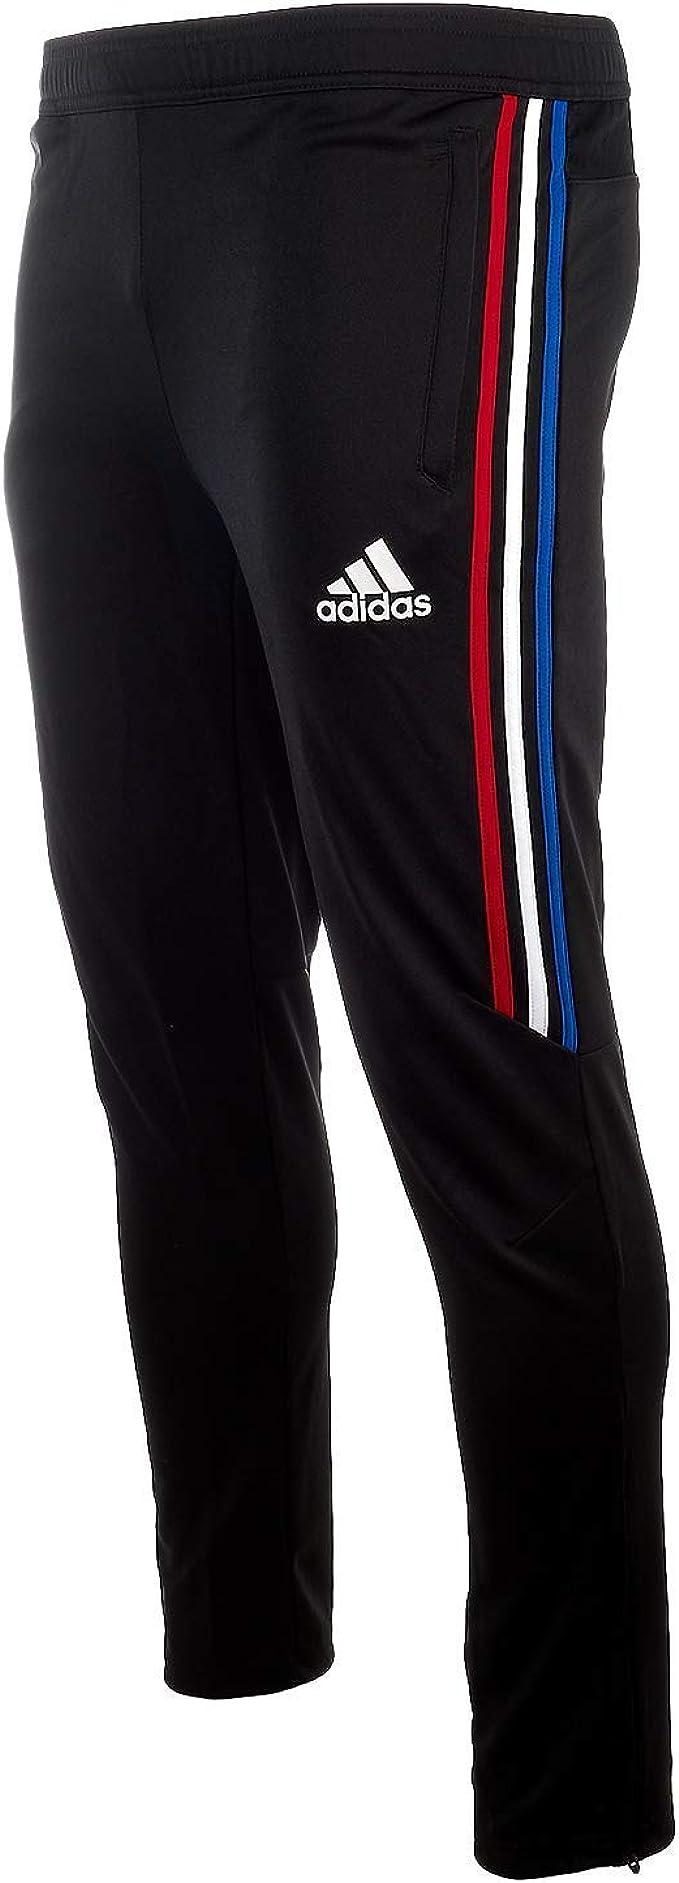 adidas TIRO 17 Training Pants - Black